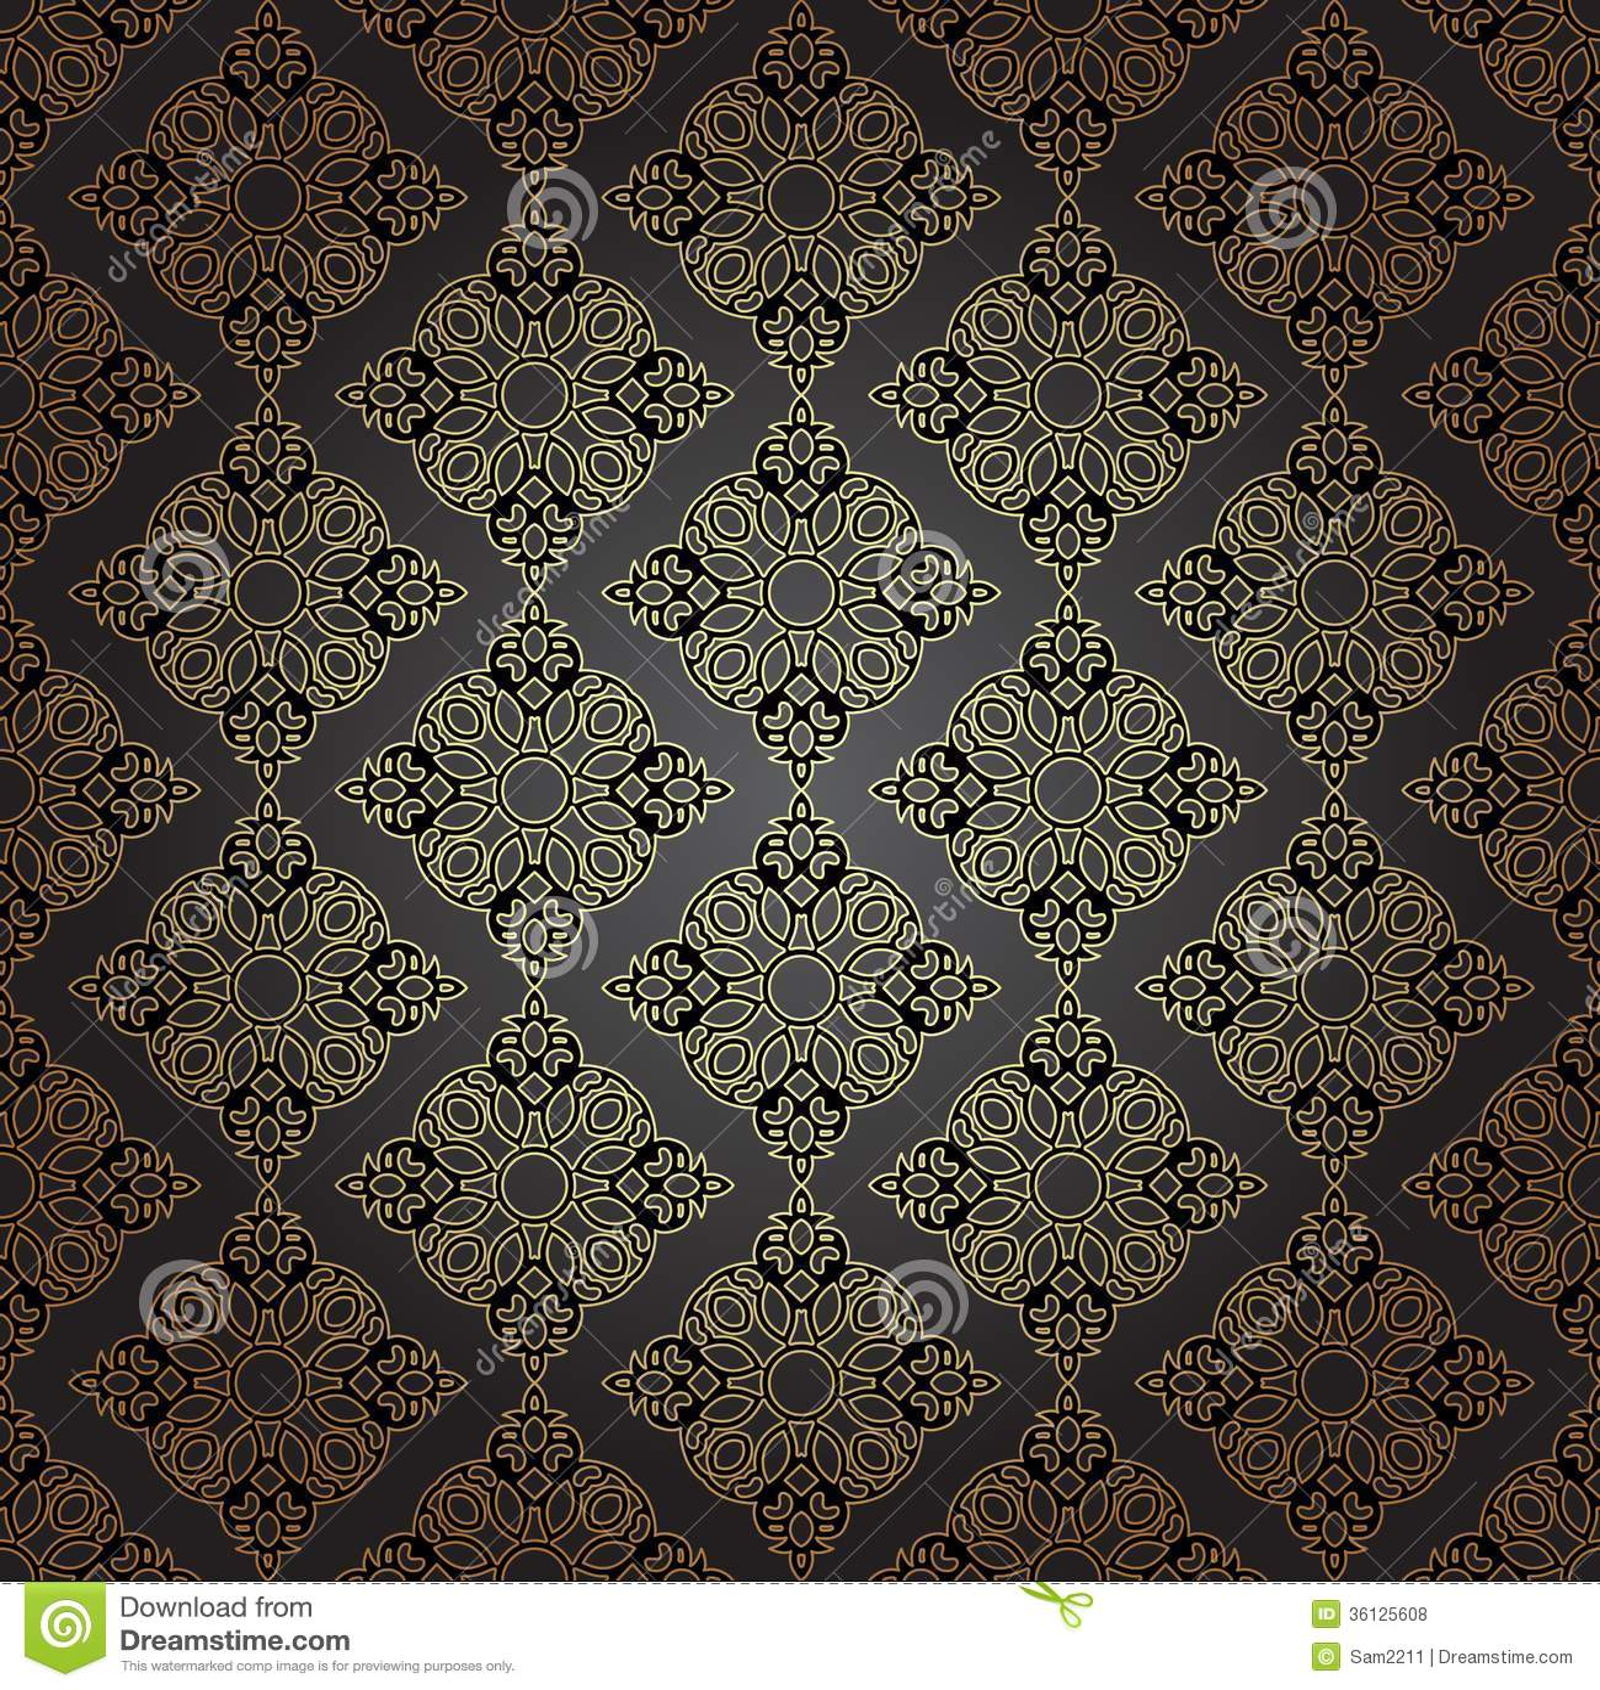 Plain Black Wallpaper Seamless Pattern In Mosaic Ethnic Style Royalty Free